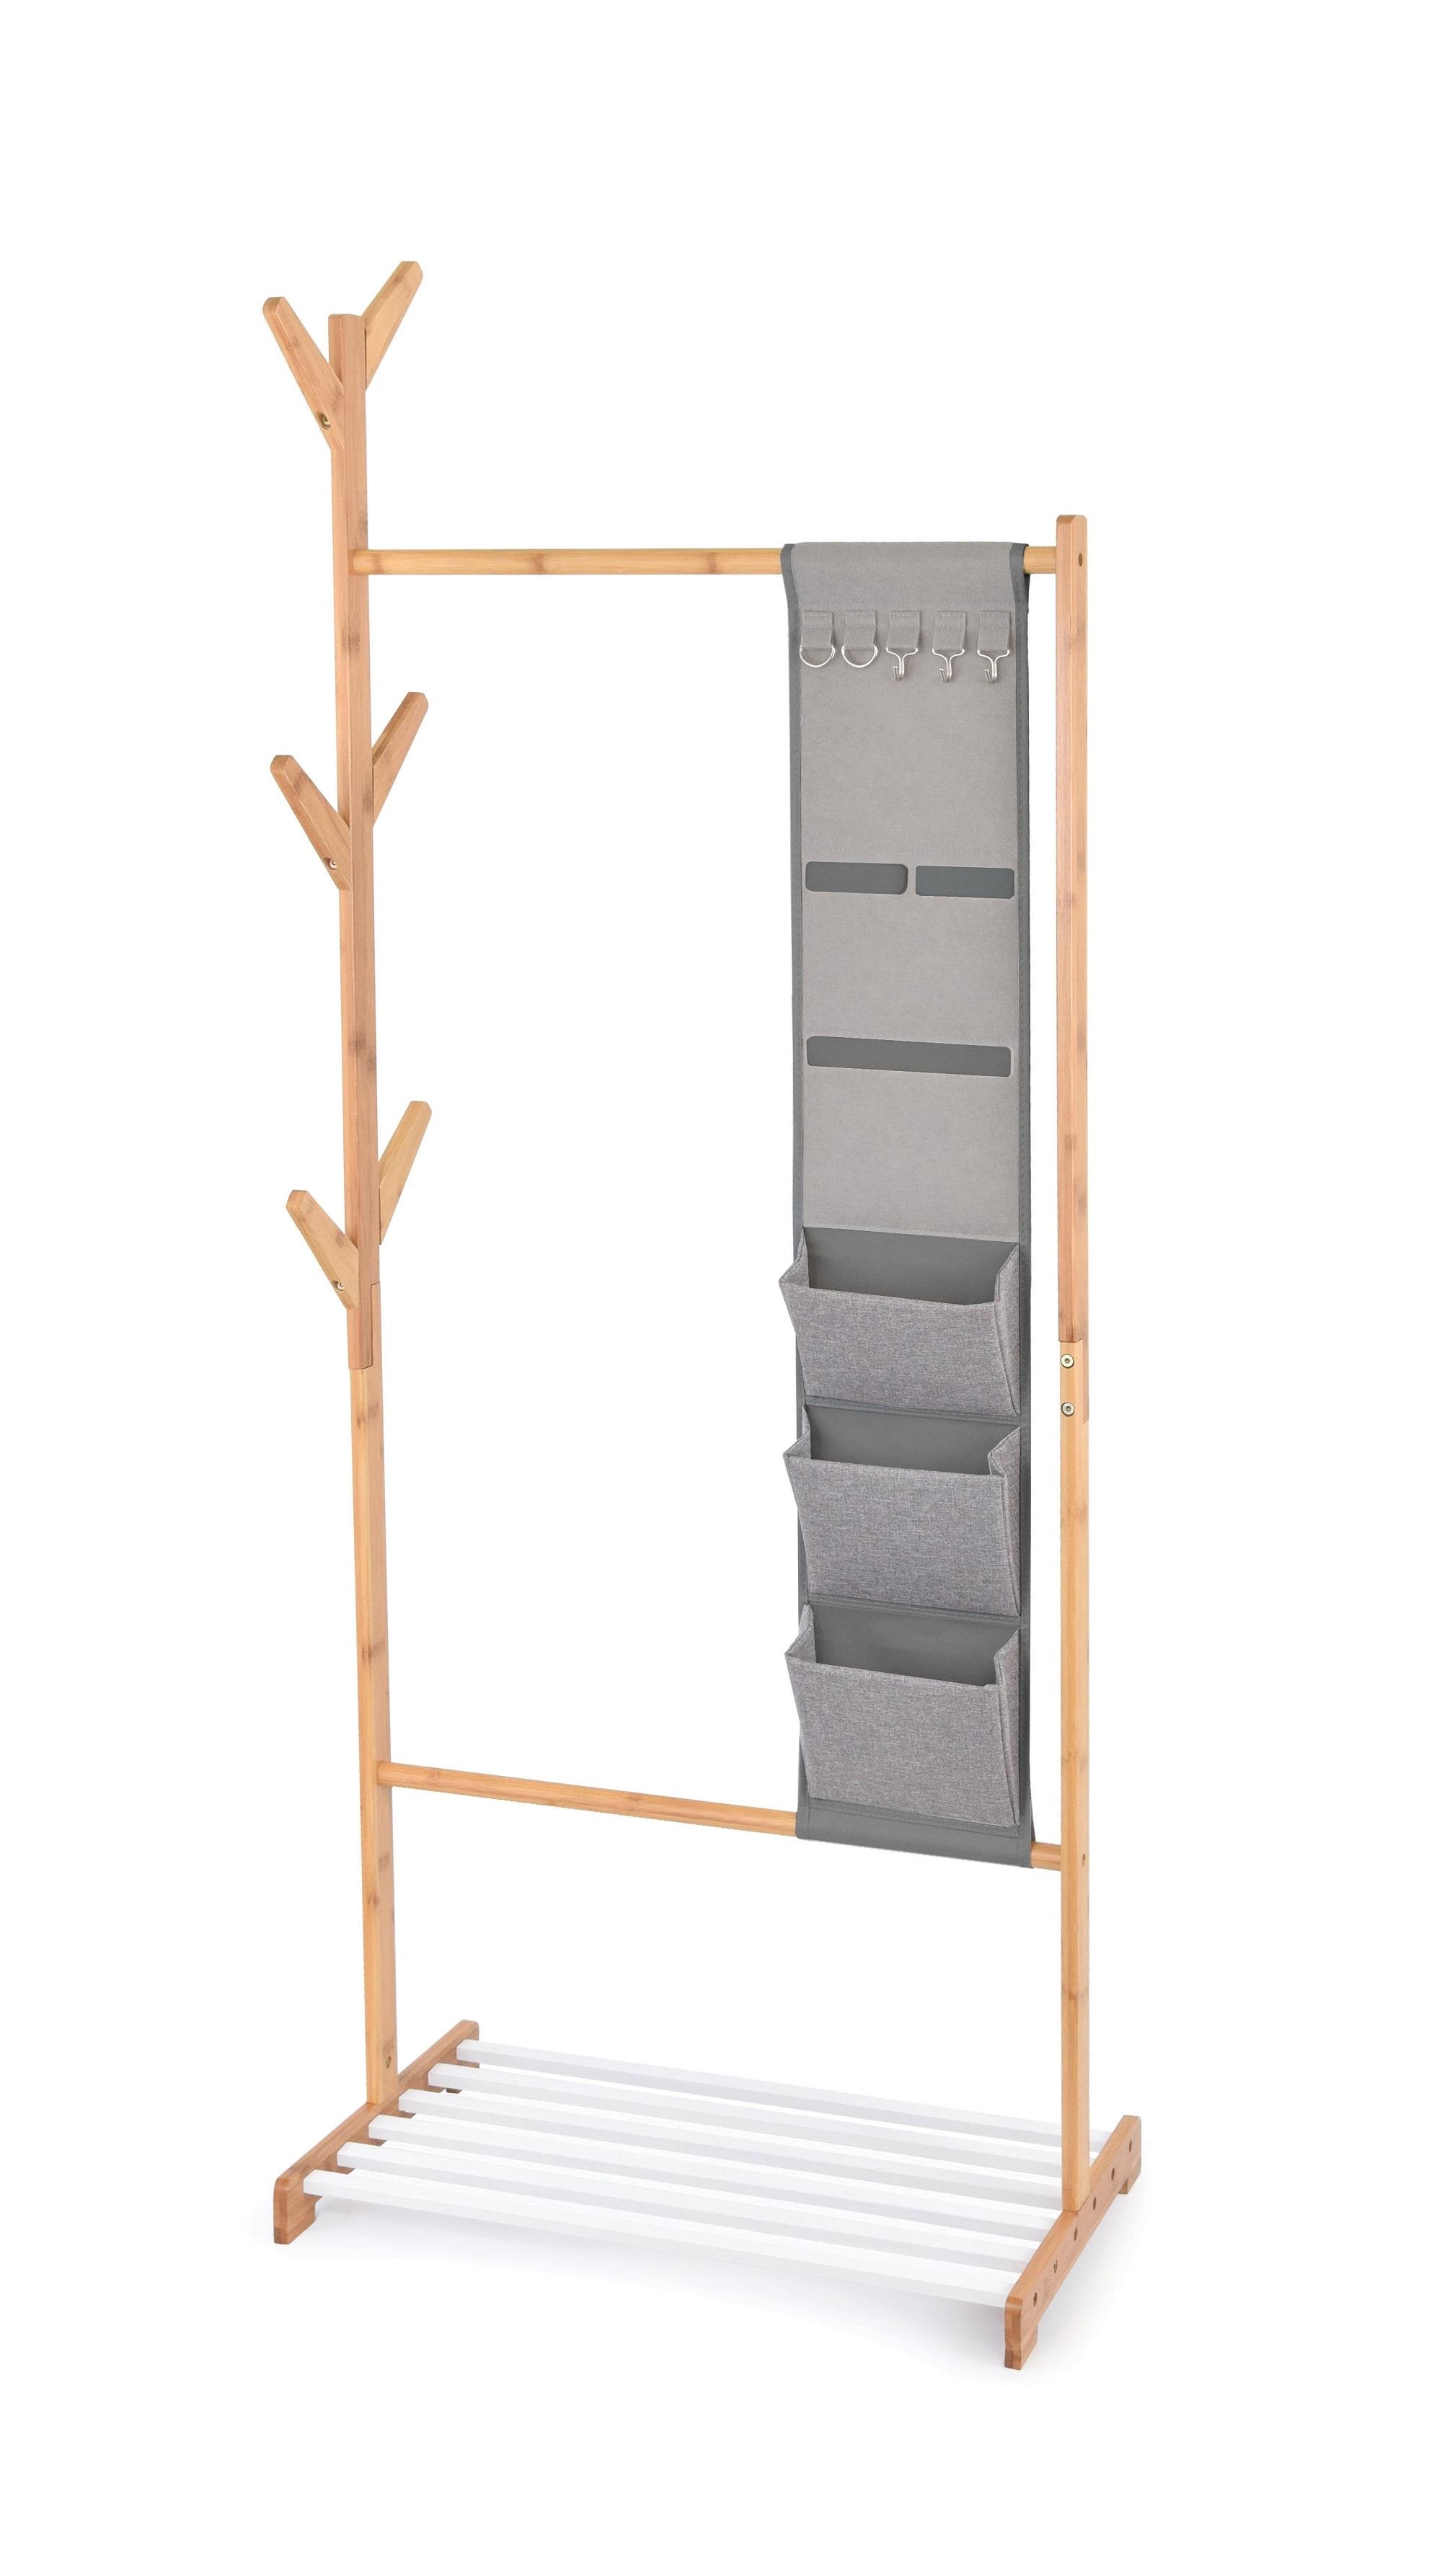 Suport pentru umerase si incaltaminte, cu organizator pentru accesorii, Bamboo II Natural / Alb, l65xA38xH167 cm imagine